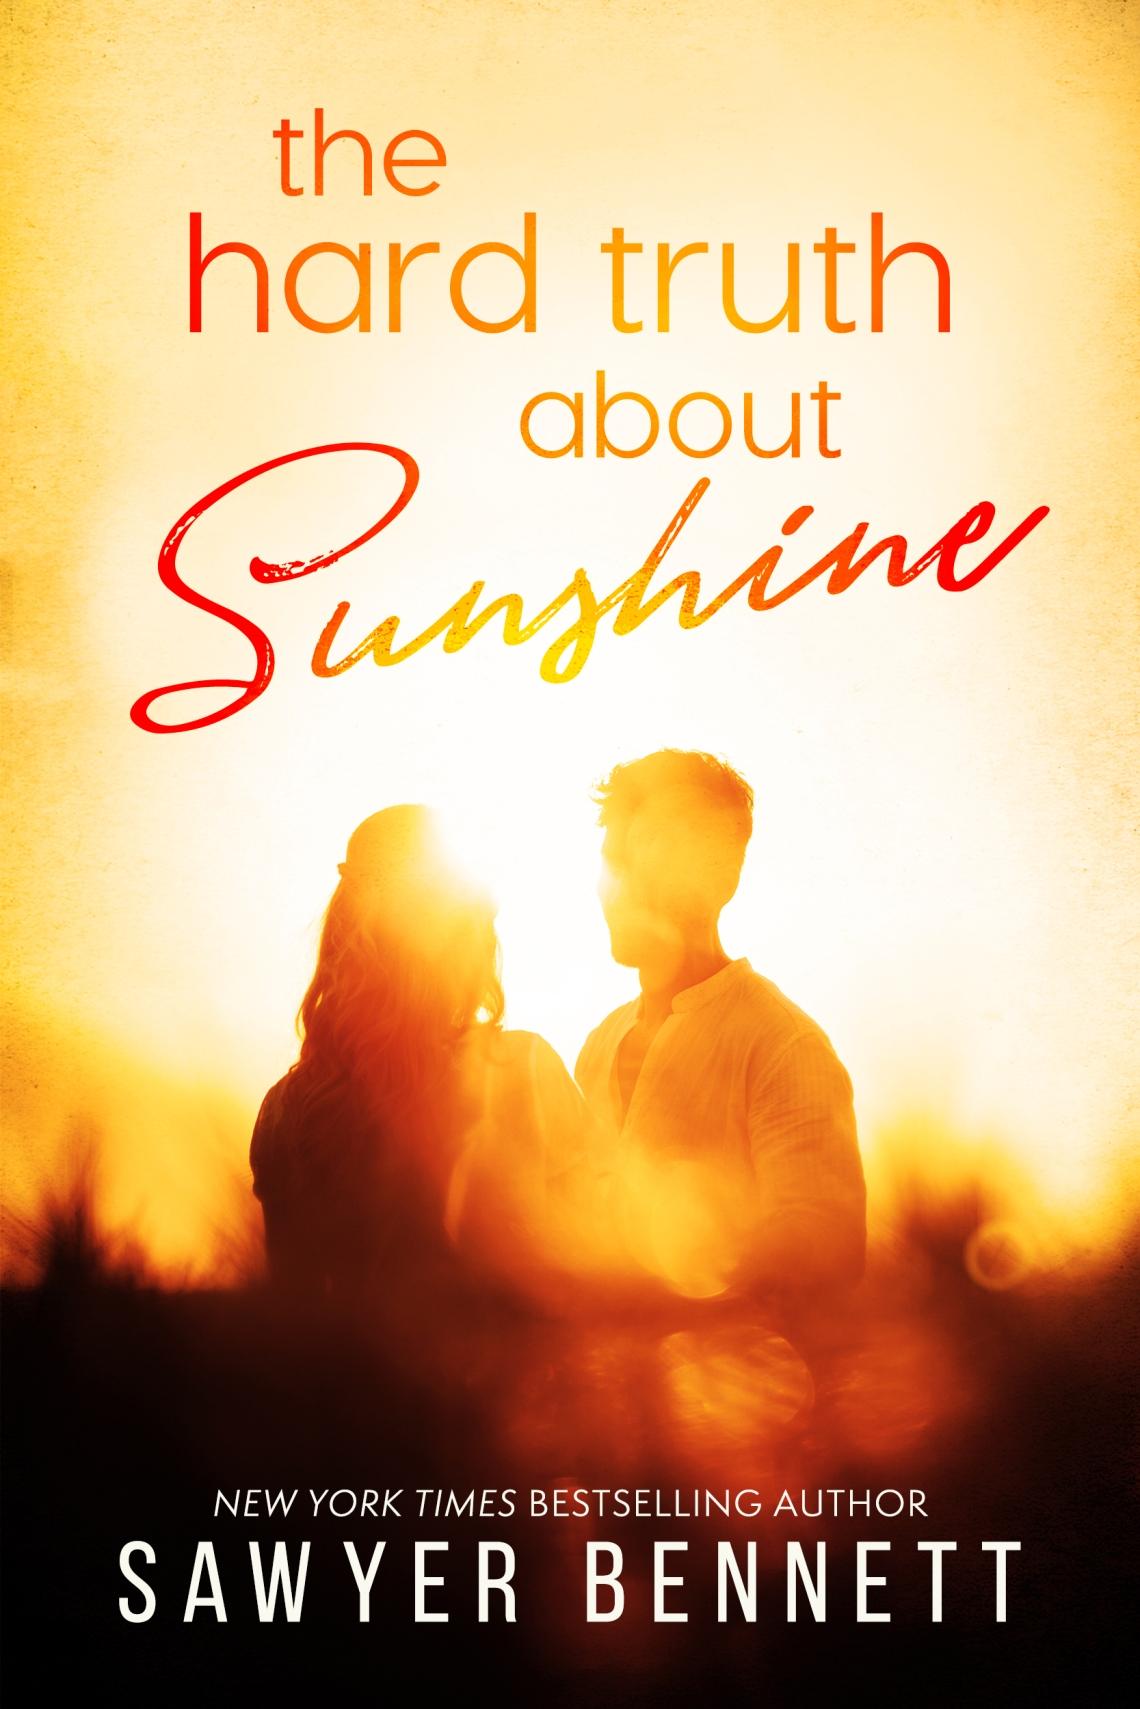 the-hard-truth-about-sunshine-amazon